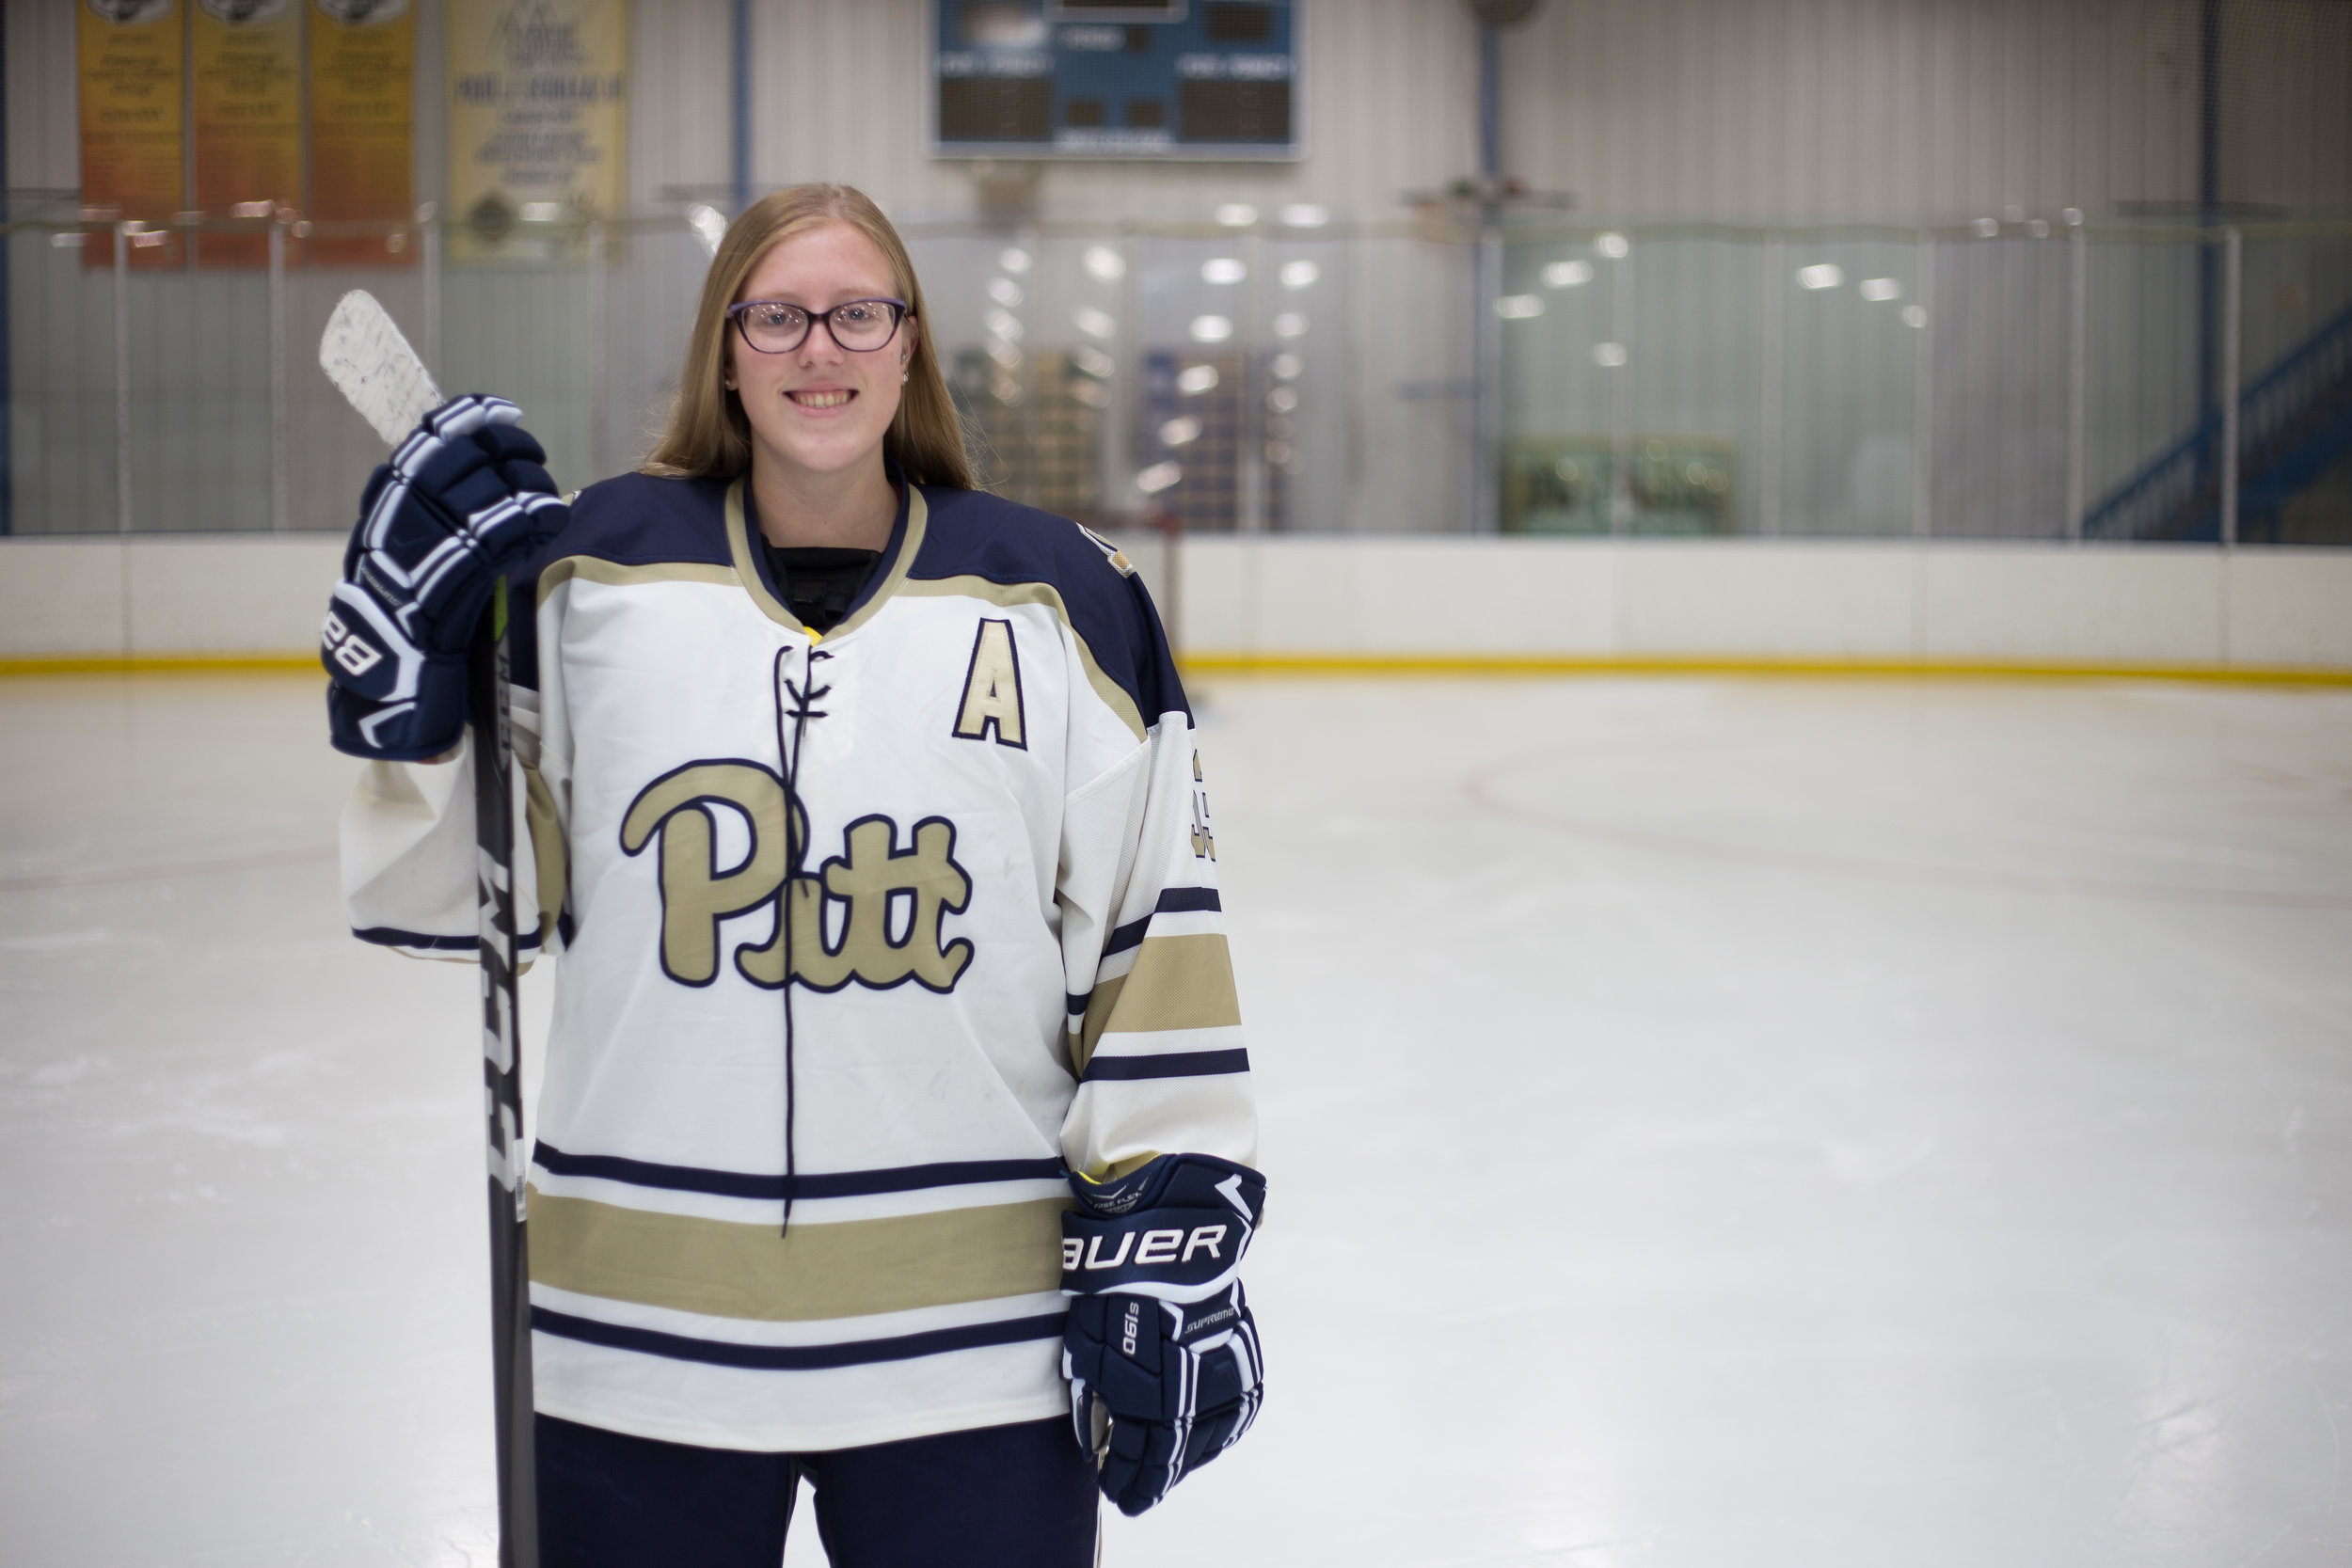 hockeyPortraits-23.JPG